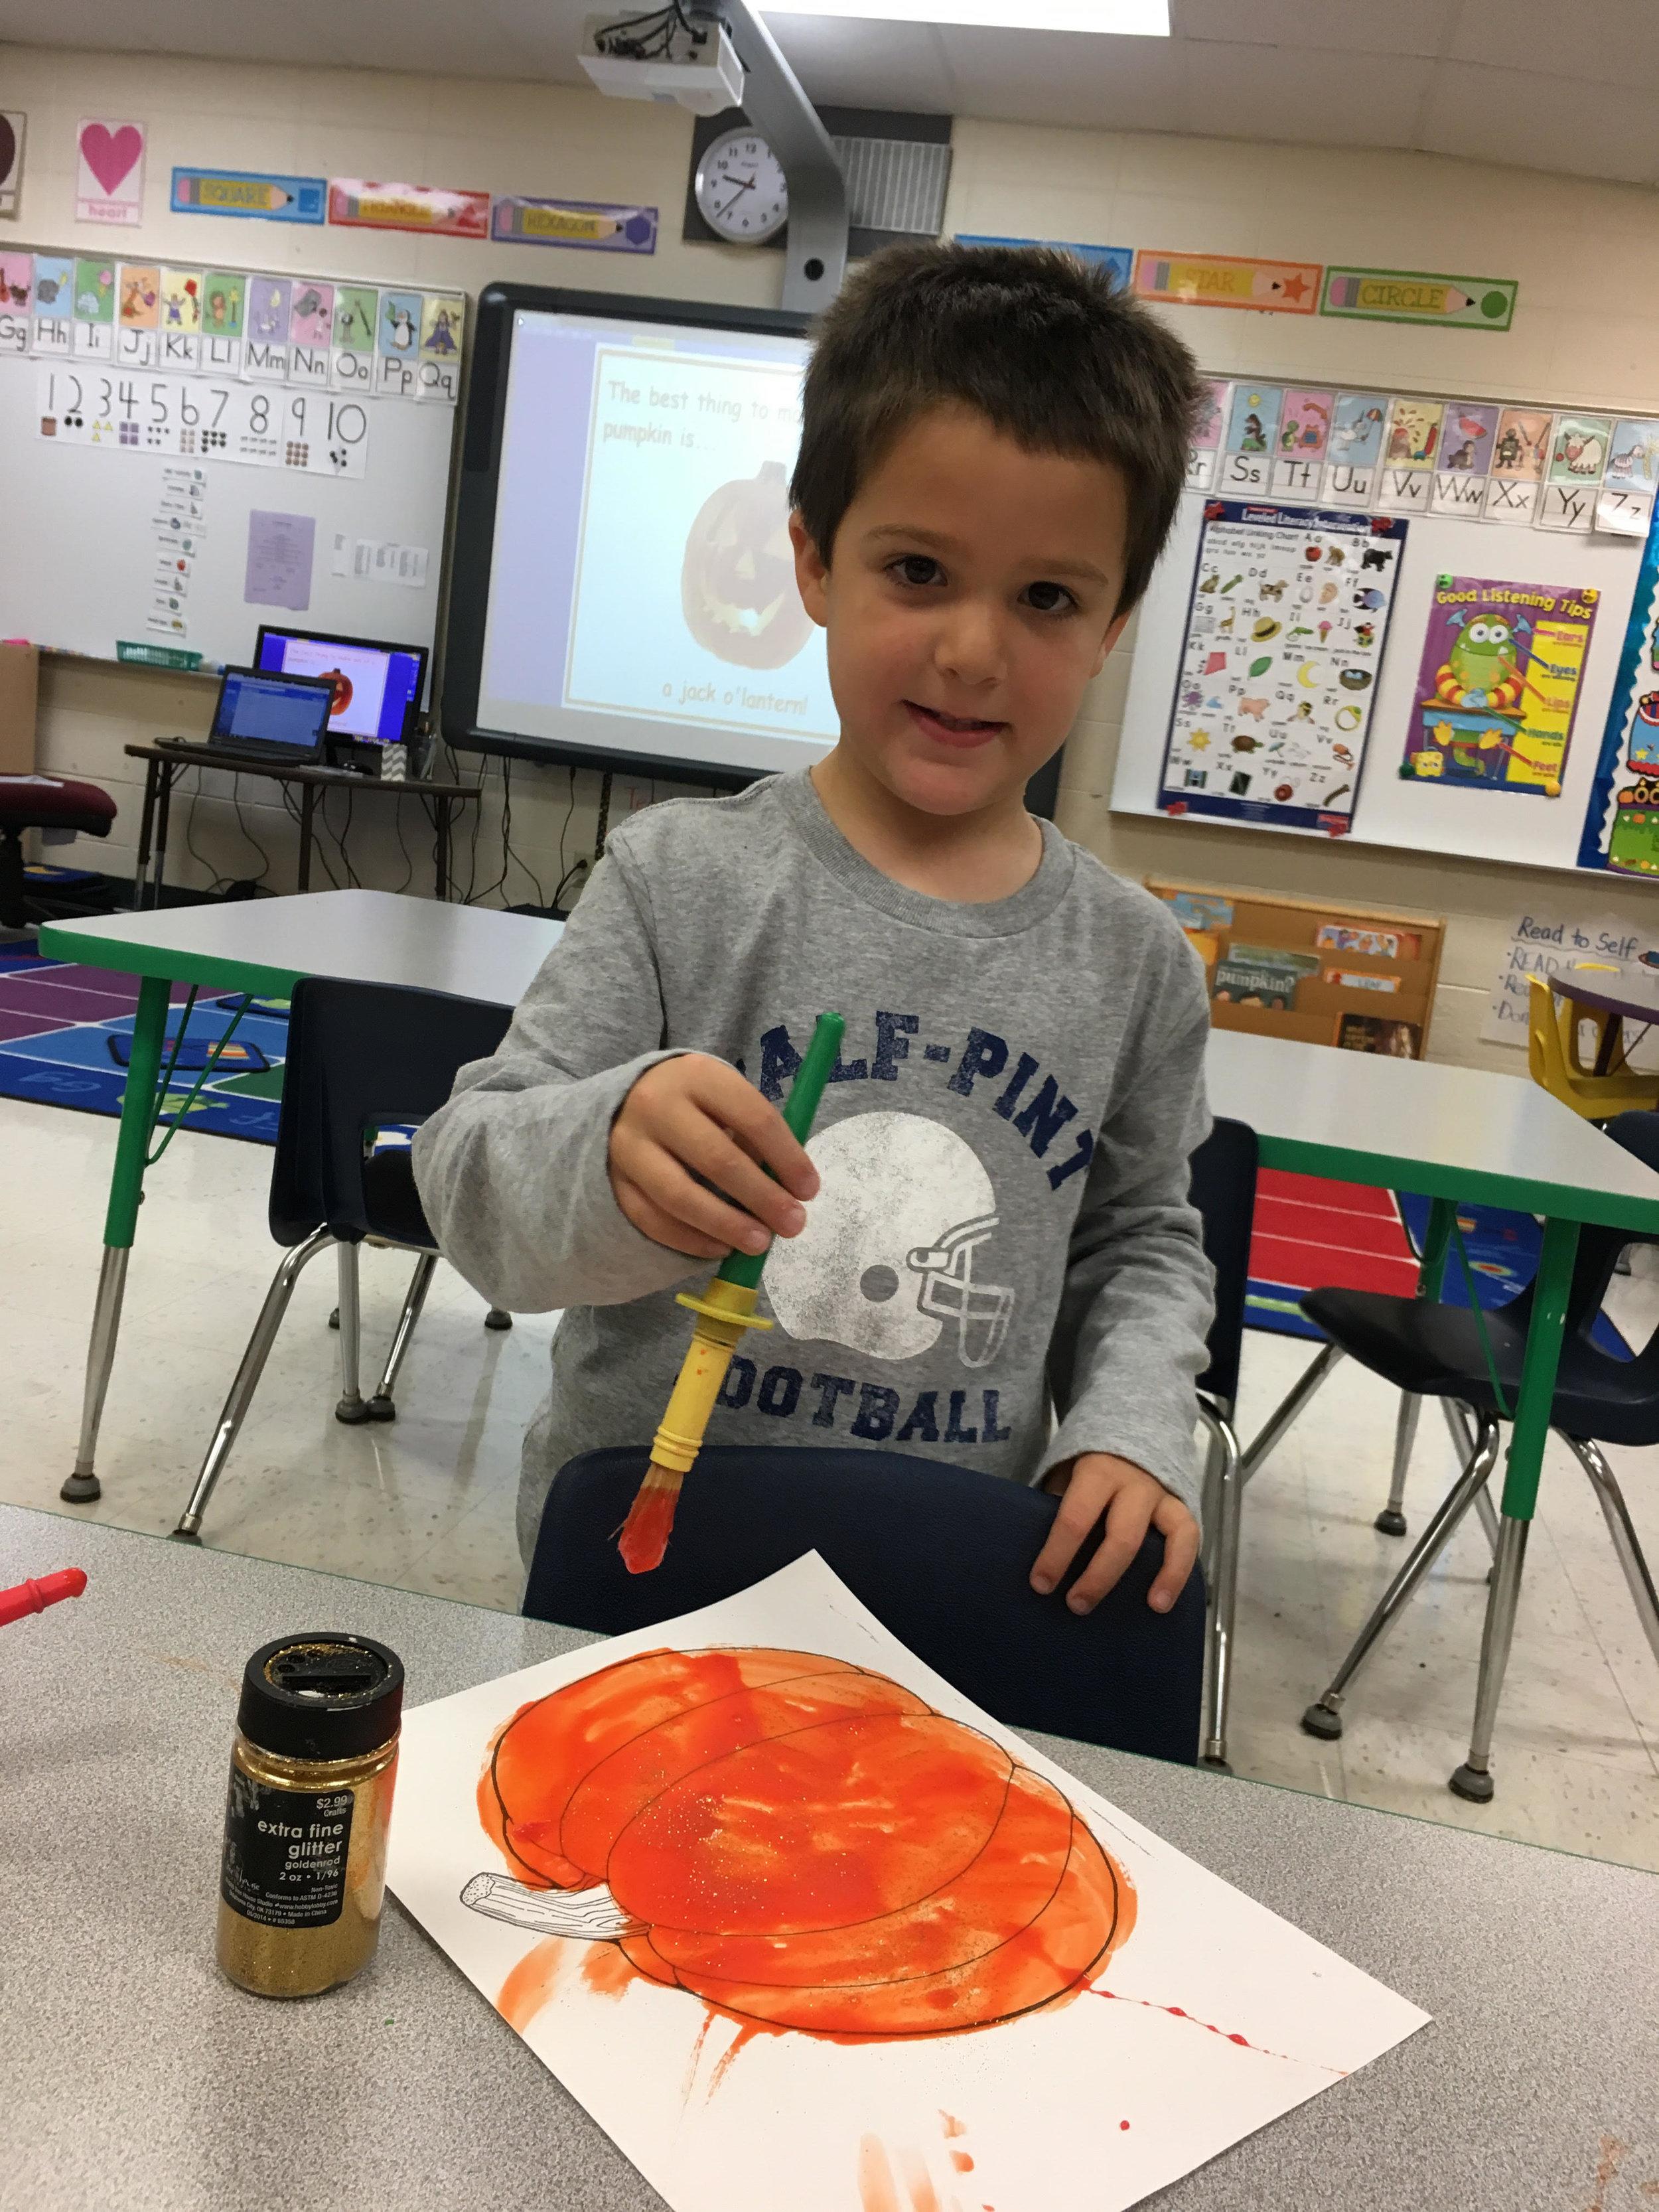 Painting pumpkins with sweetened condensed milk